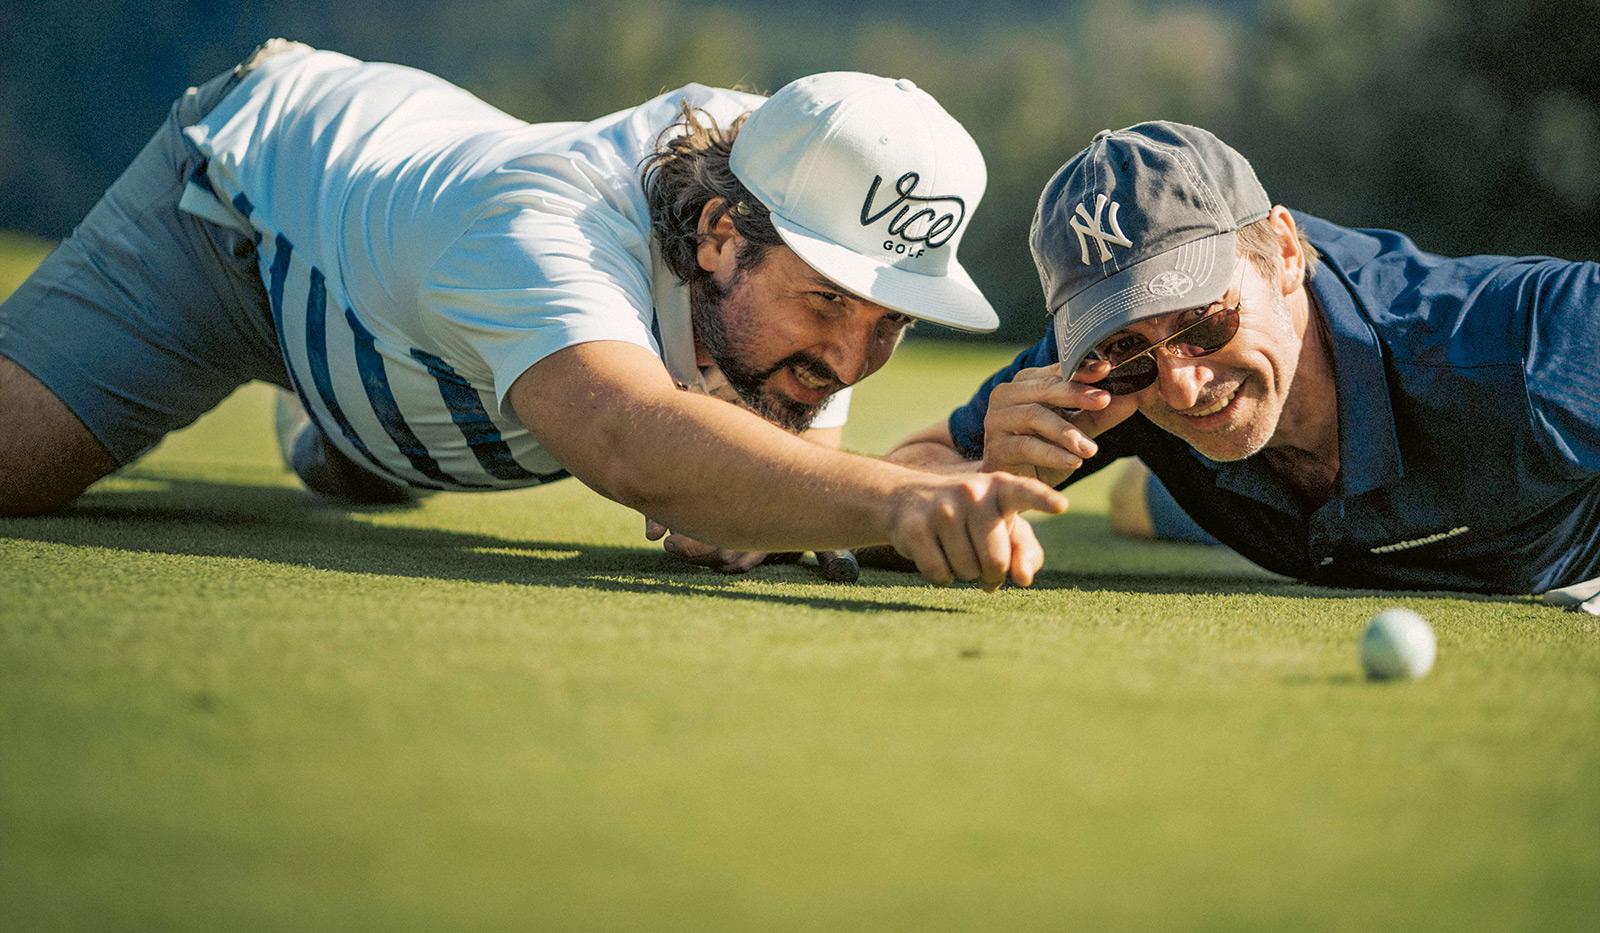 celebrity golf camp - Celebrity Golf Camp